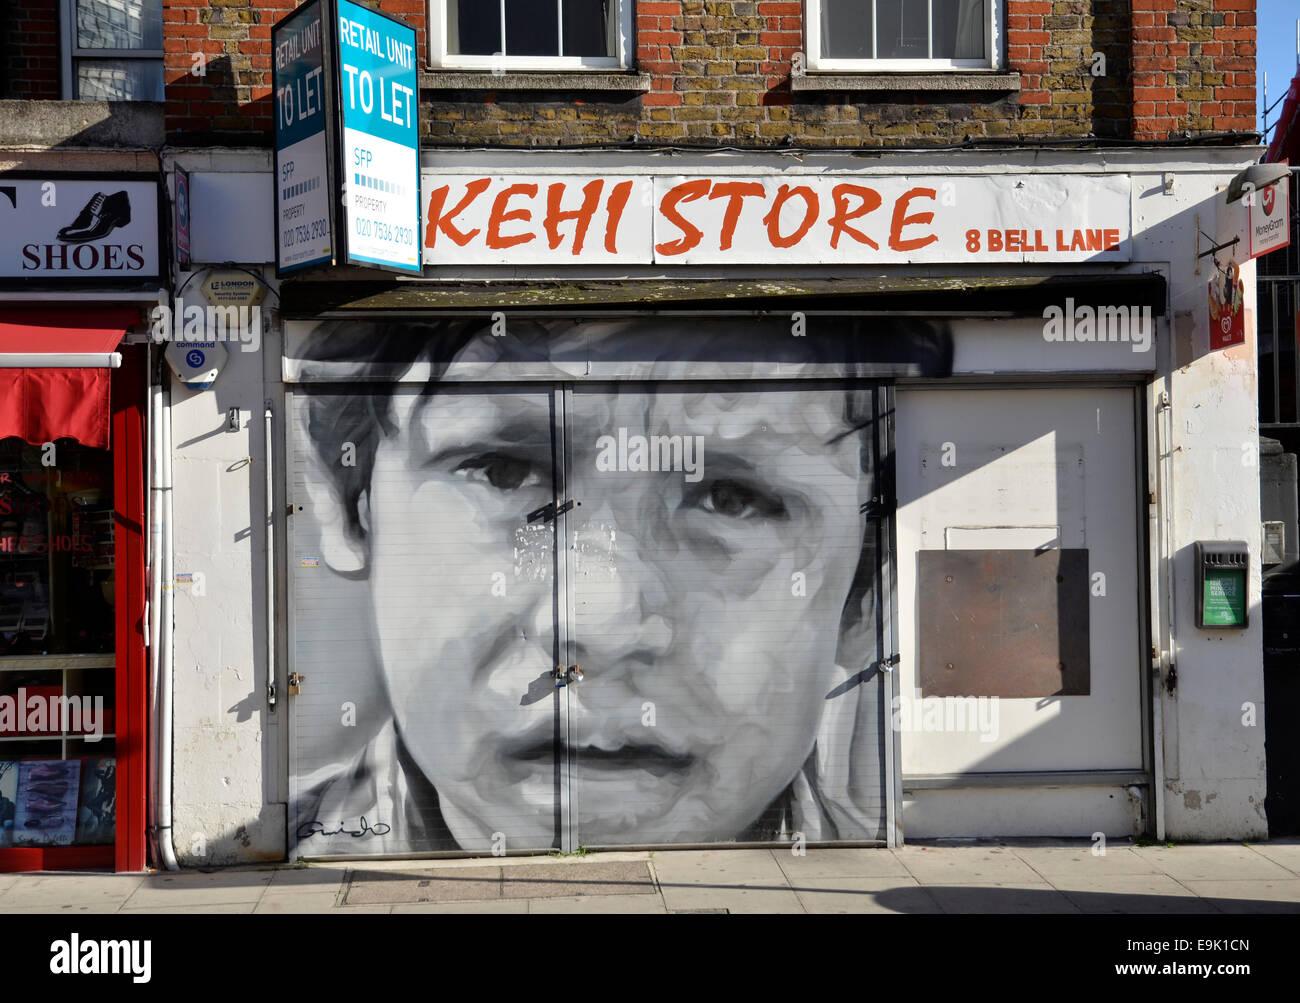 A derelict business premises in Bell Lane, Spitalfields, London covered in street art grafitti - Stock Image